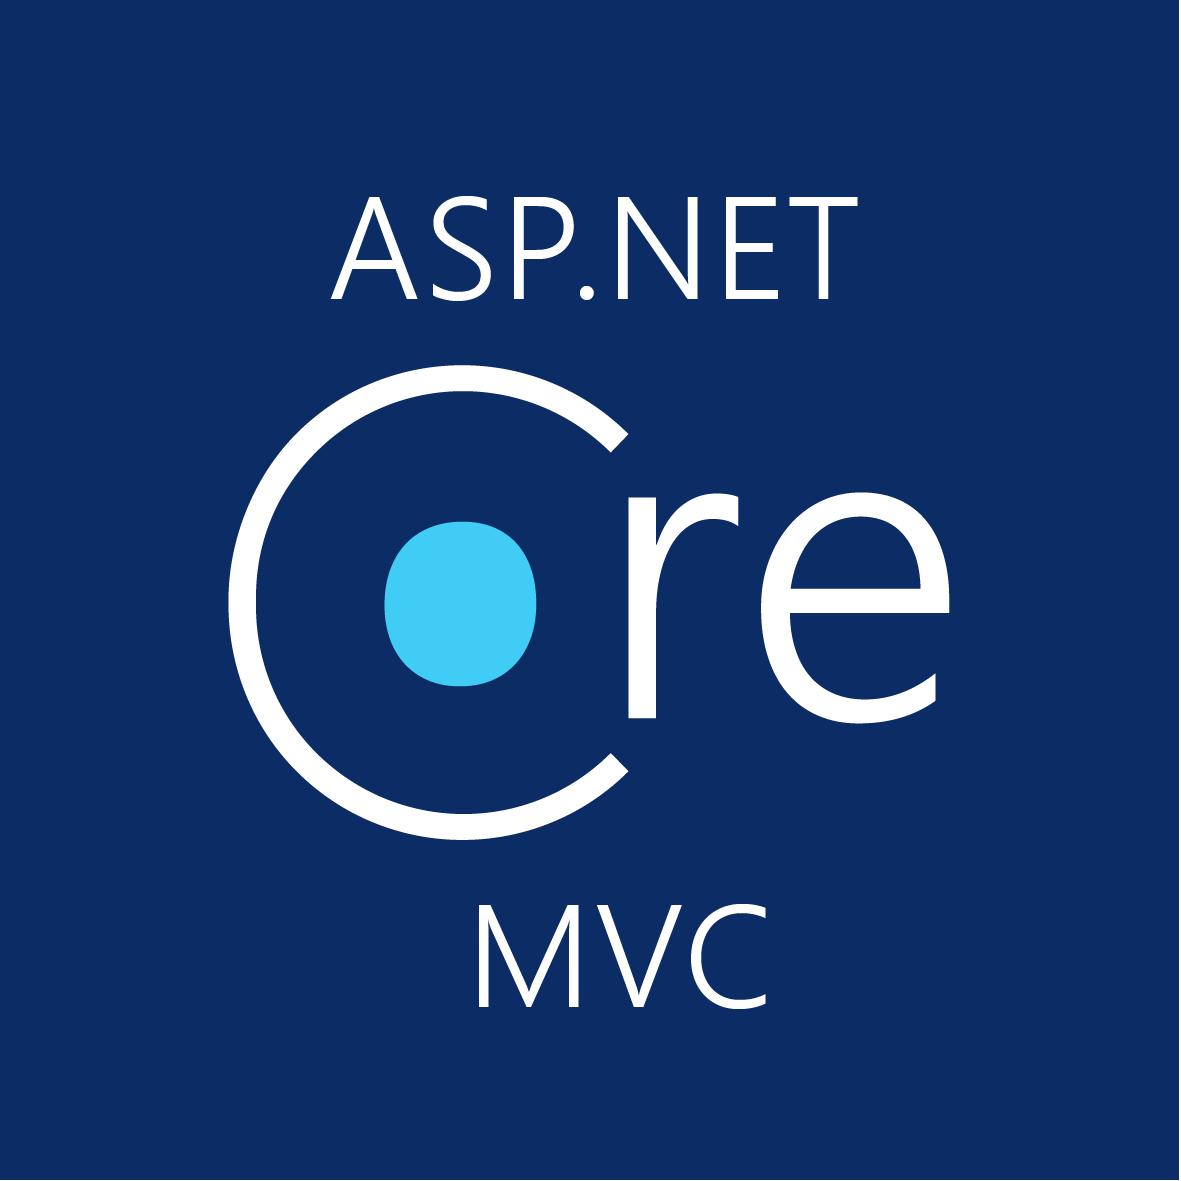 https://raw.githubusercontent.com/campusMVP/dotnetCoreLogoPack/master/ASP.NET%20Core%20MVC/Bitmap%20RGB/Bitmap-BIG_ASP.NET-Core-MVC-Logo_2colors_Square_Boxed_RGB.png